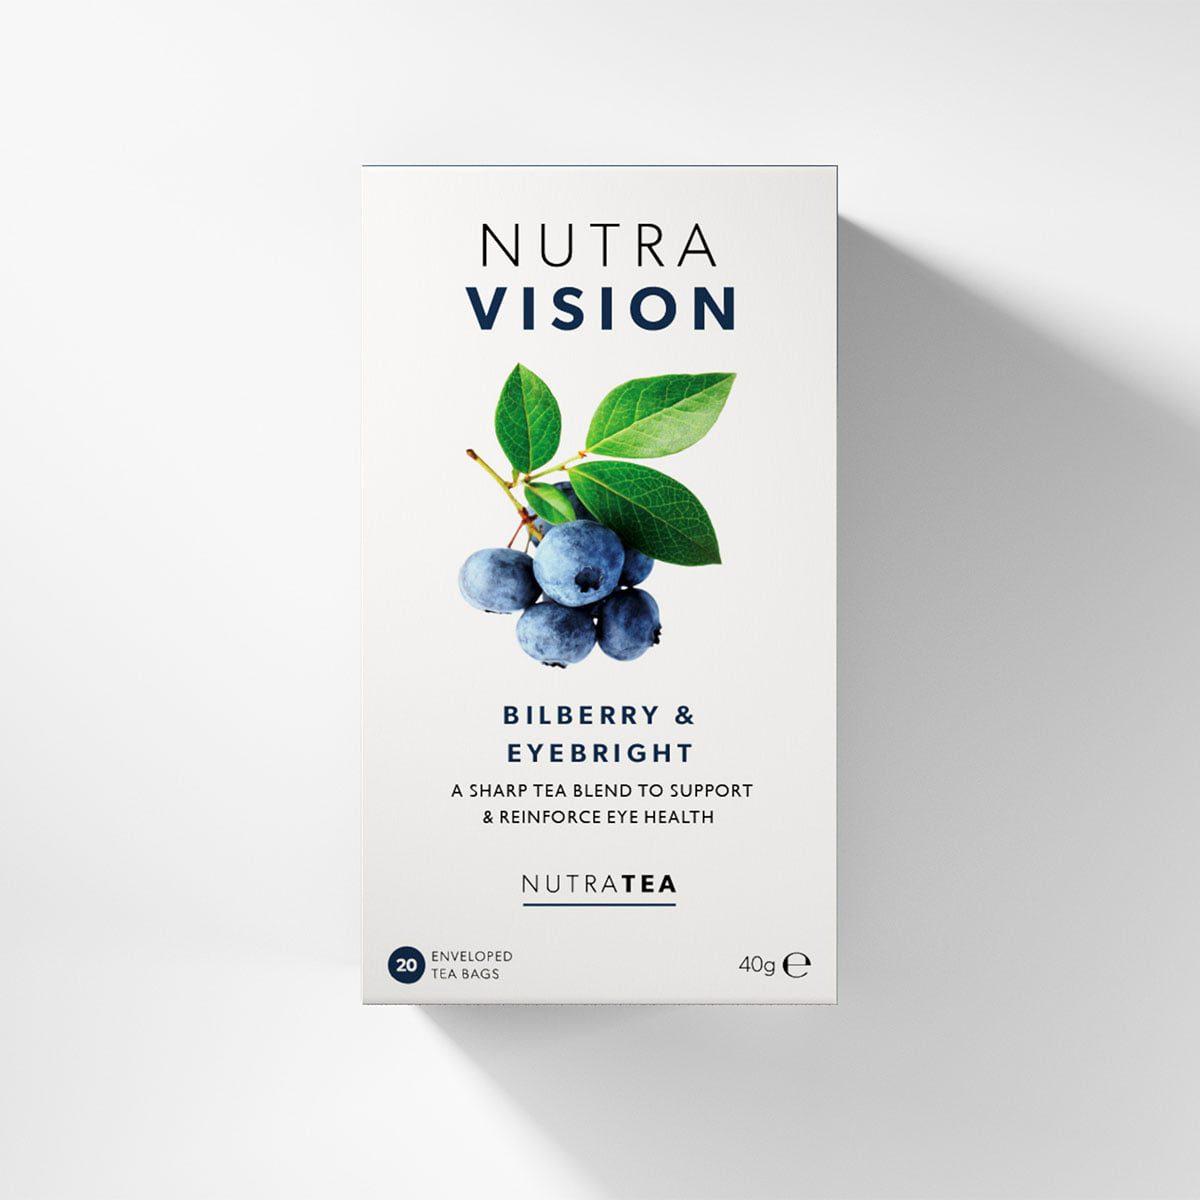 039_Box_NV_Bilberry Eyebright_Box_Front